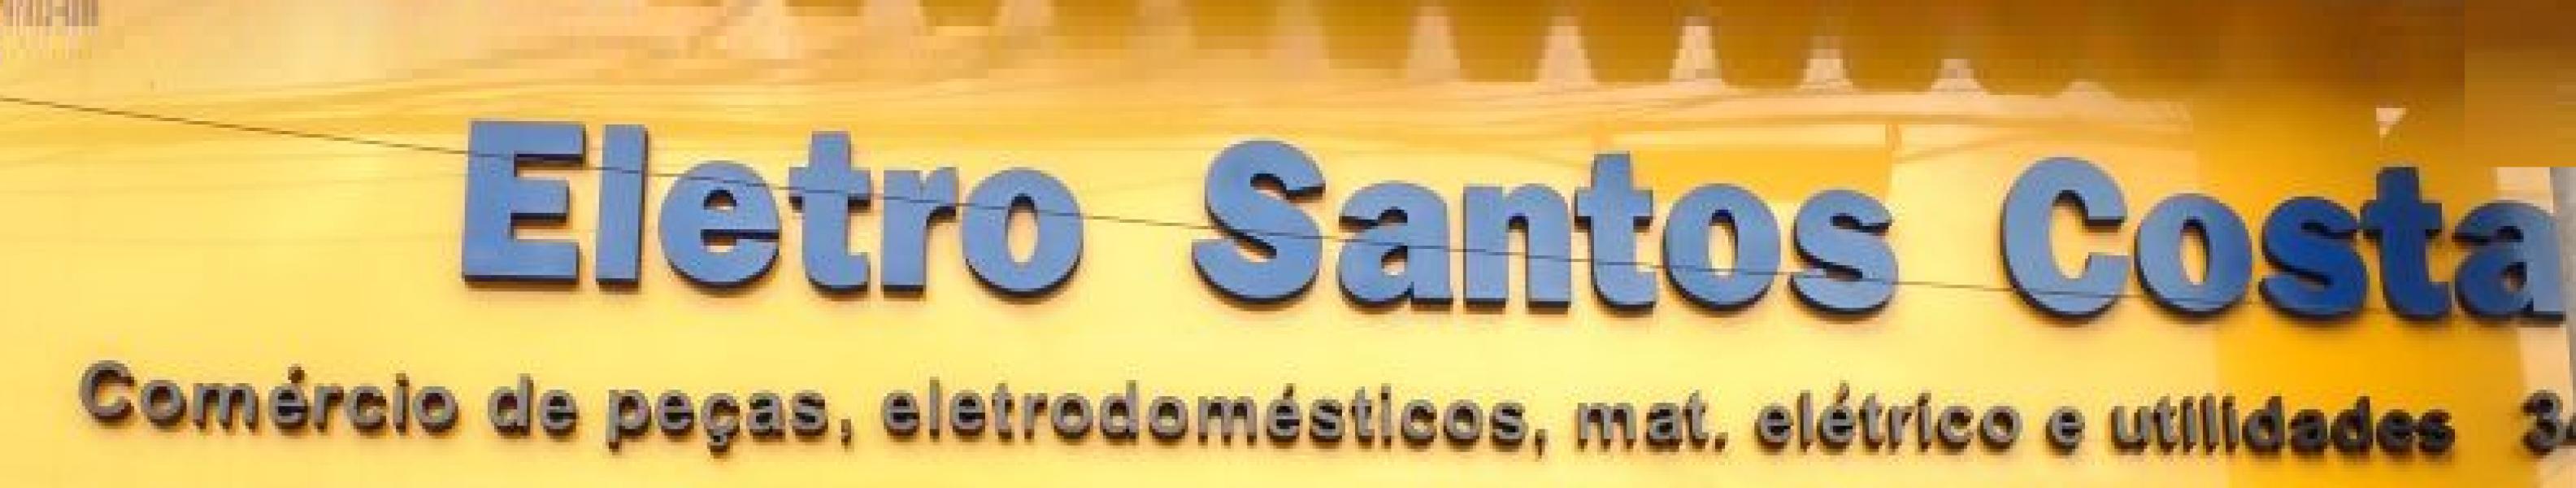 Eletro Santos Costa - Santa Cruz da Serra